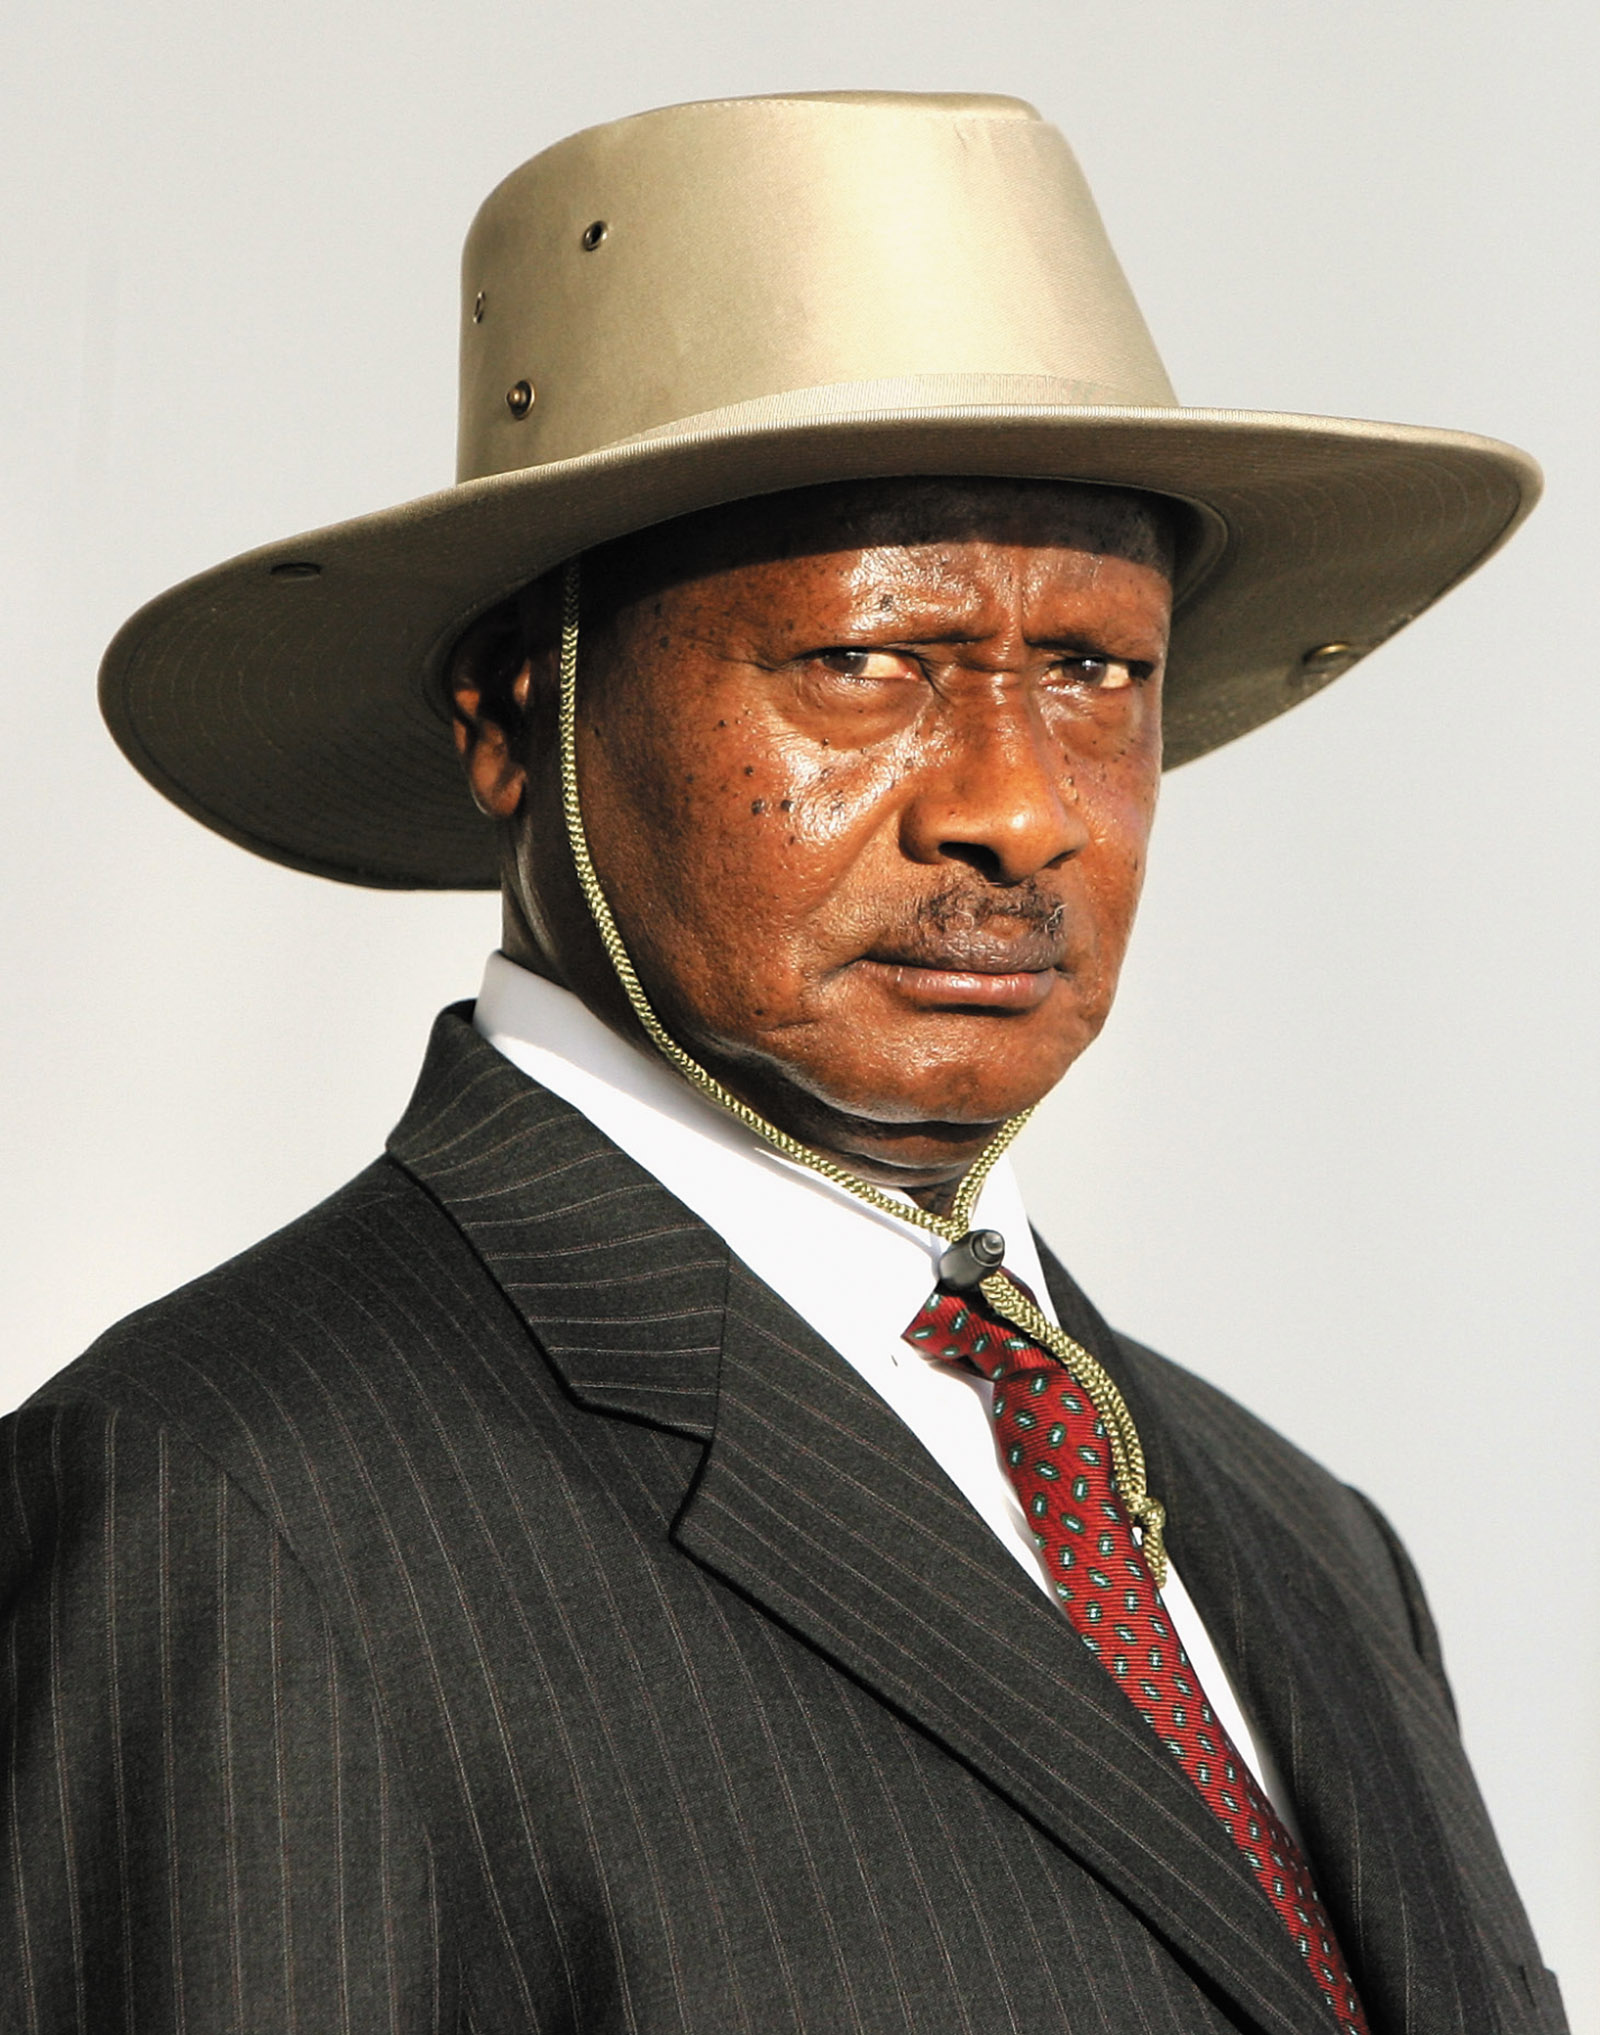 President Yoweri Museveni, Entebbe, Uganda, November 2007